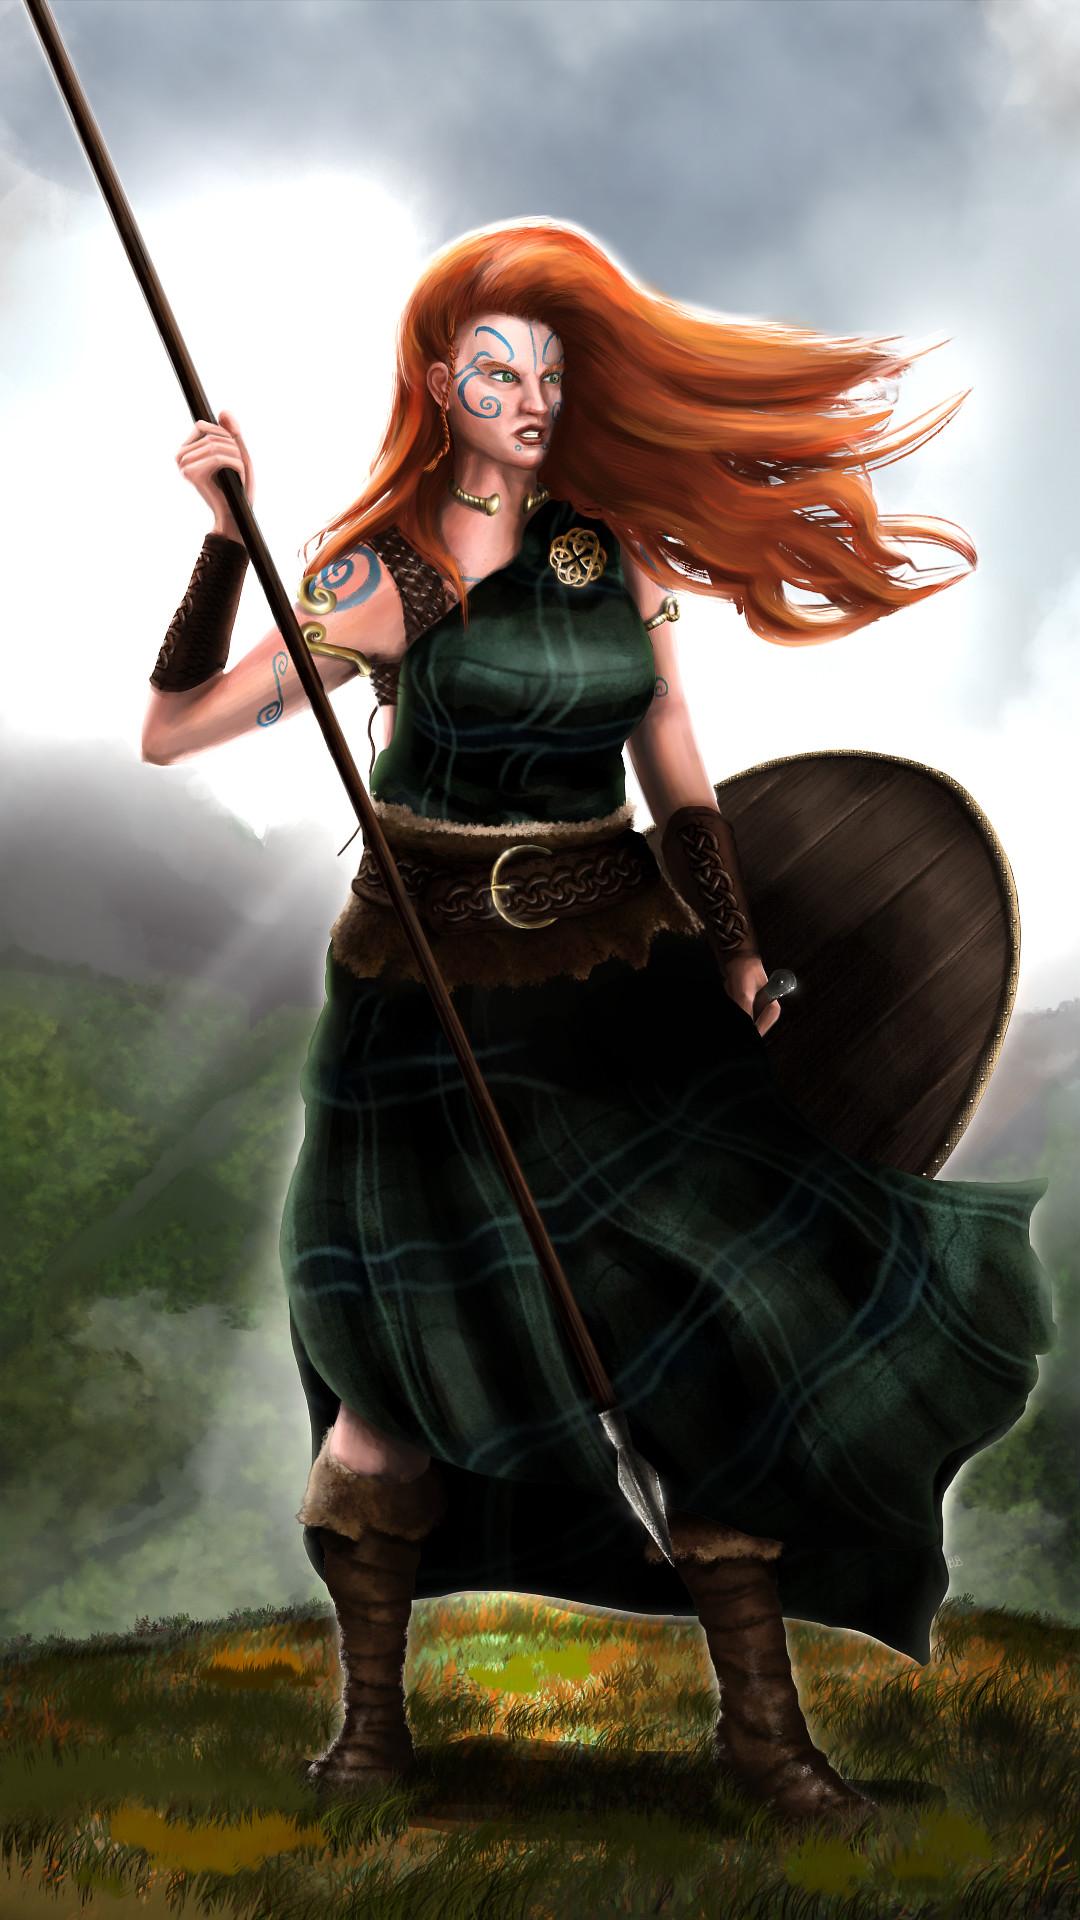 Boadicea, Queen of the Iceni